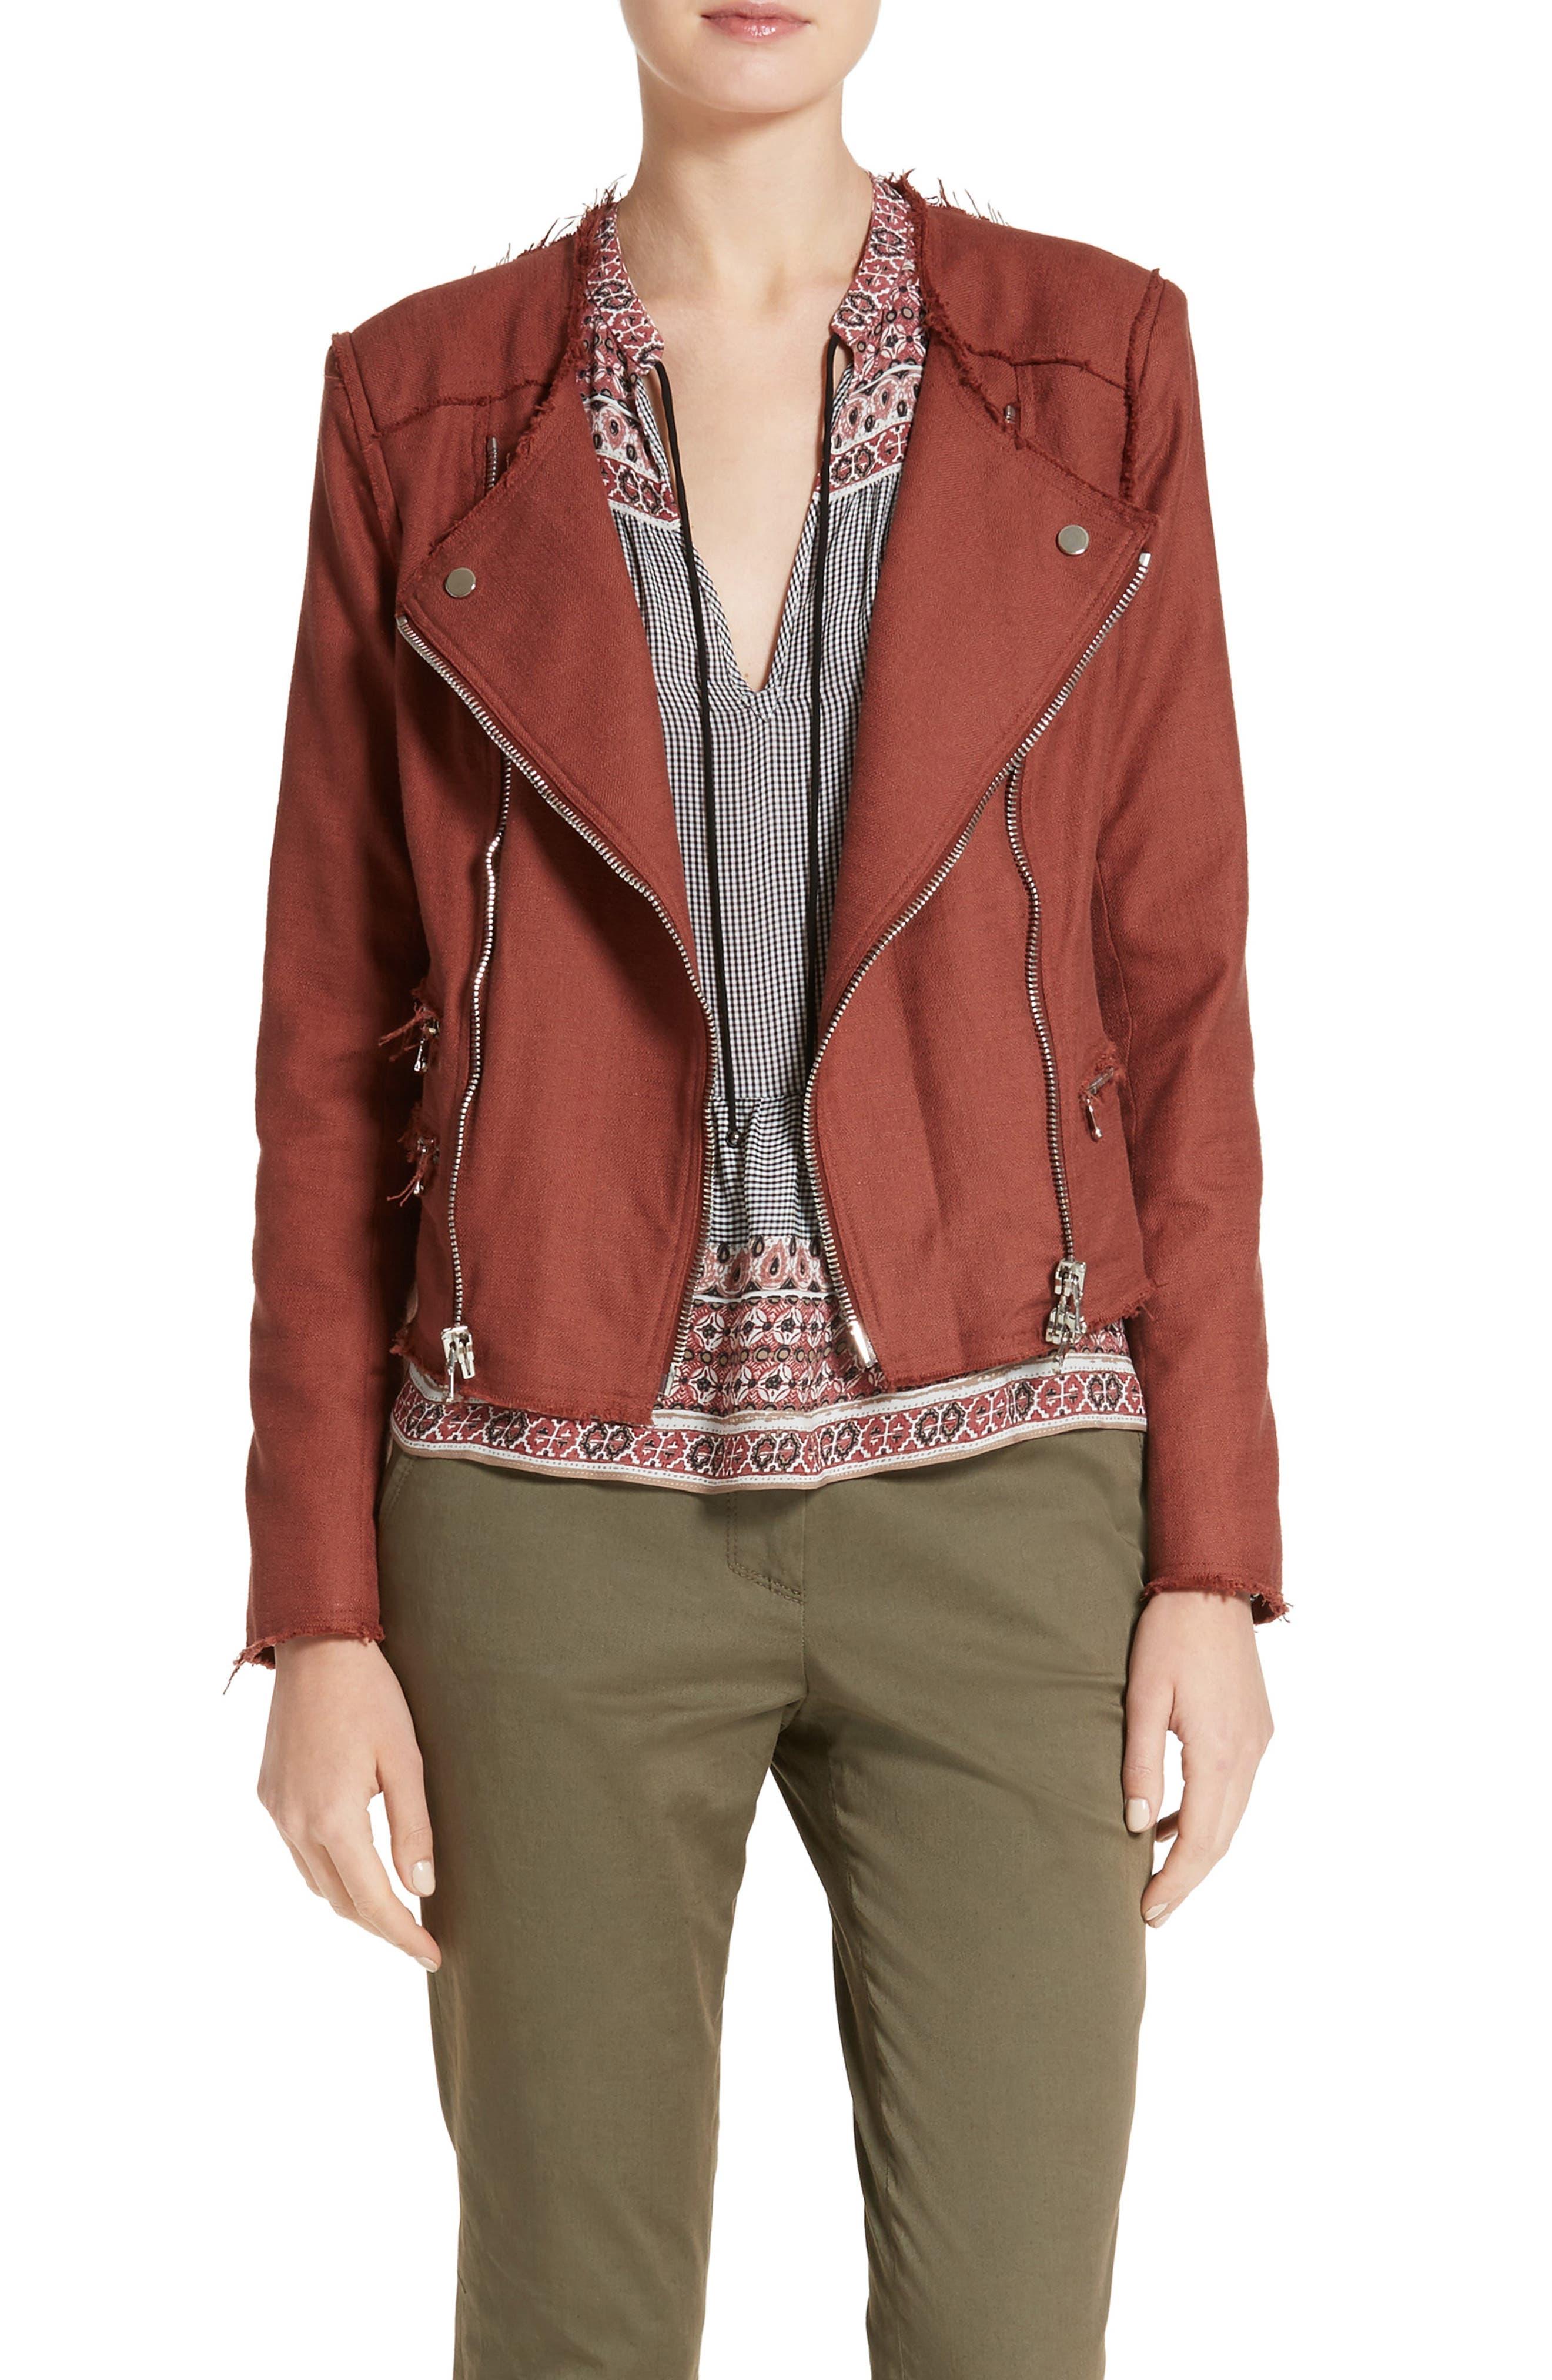 Alternate Image 1 Selected - Veronica Beard Stevie Fringe Trim Moto Jacket